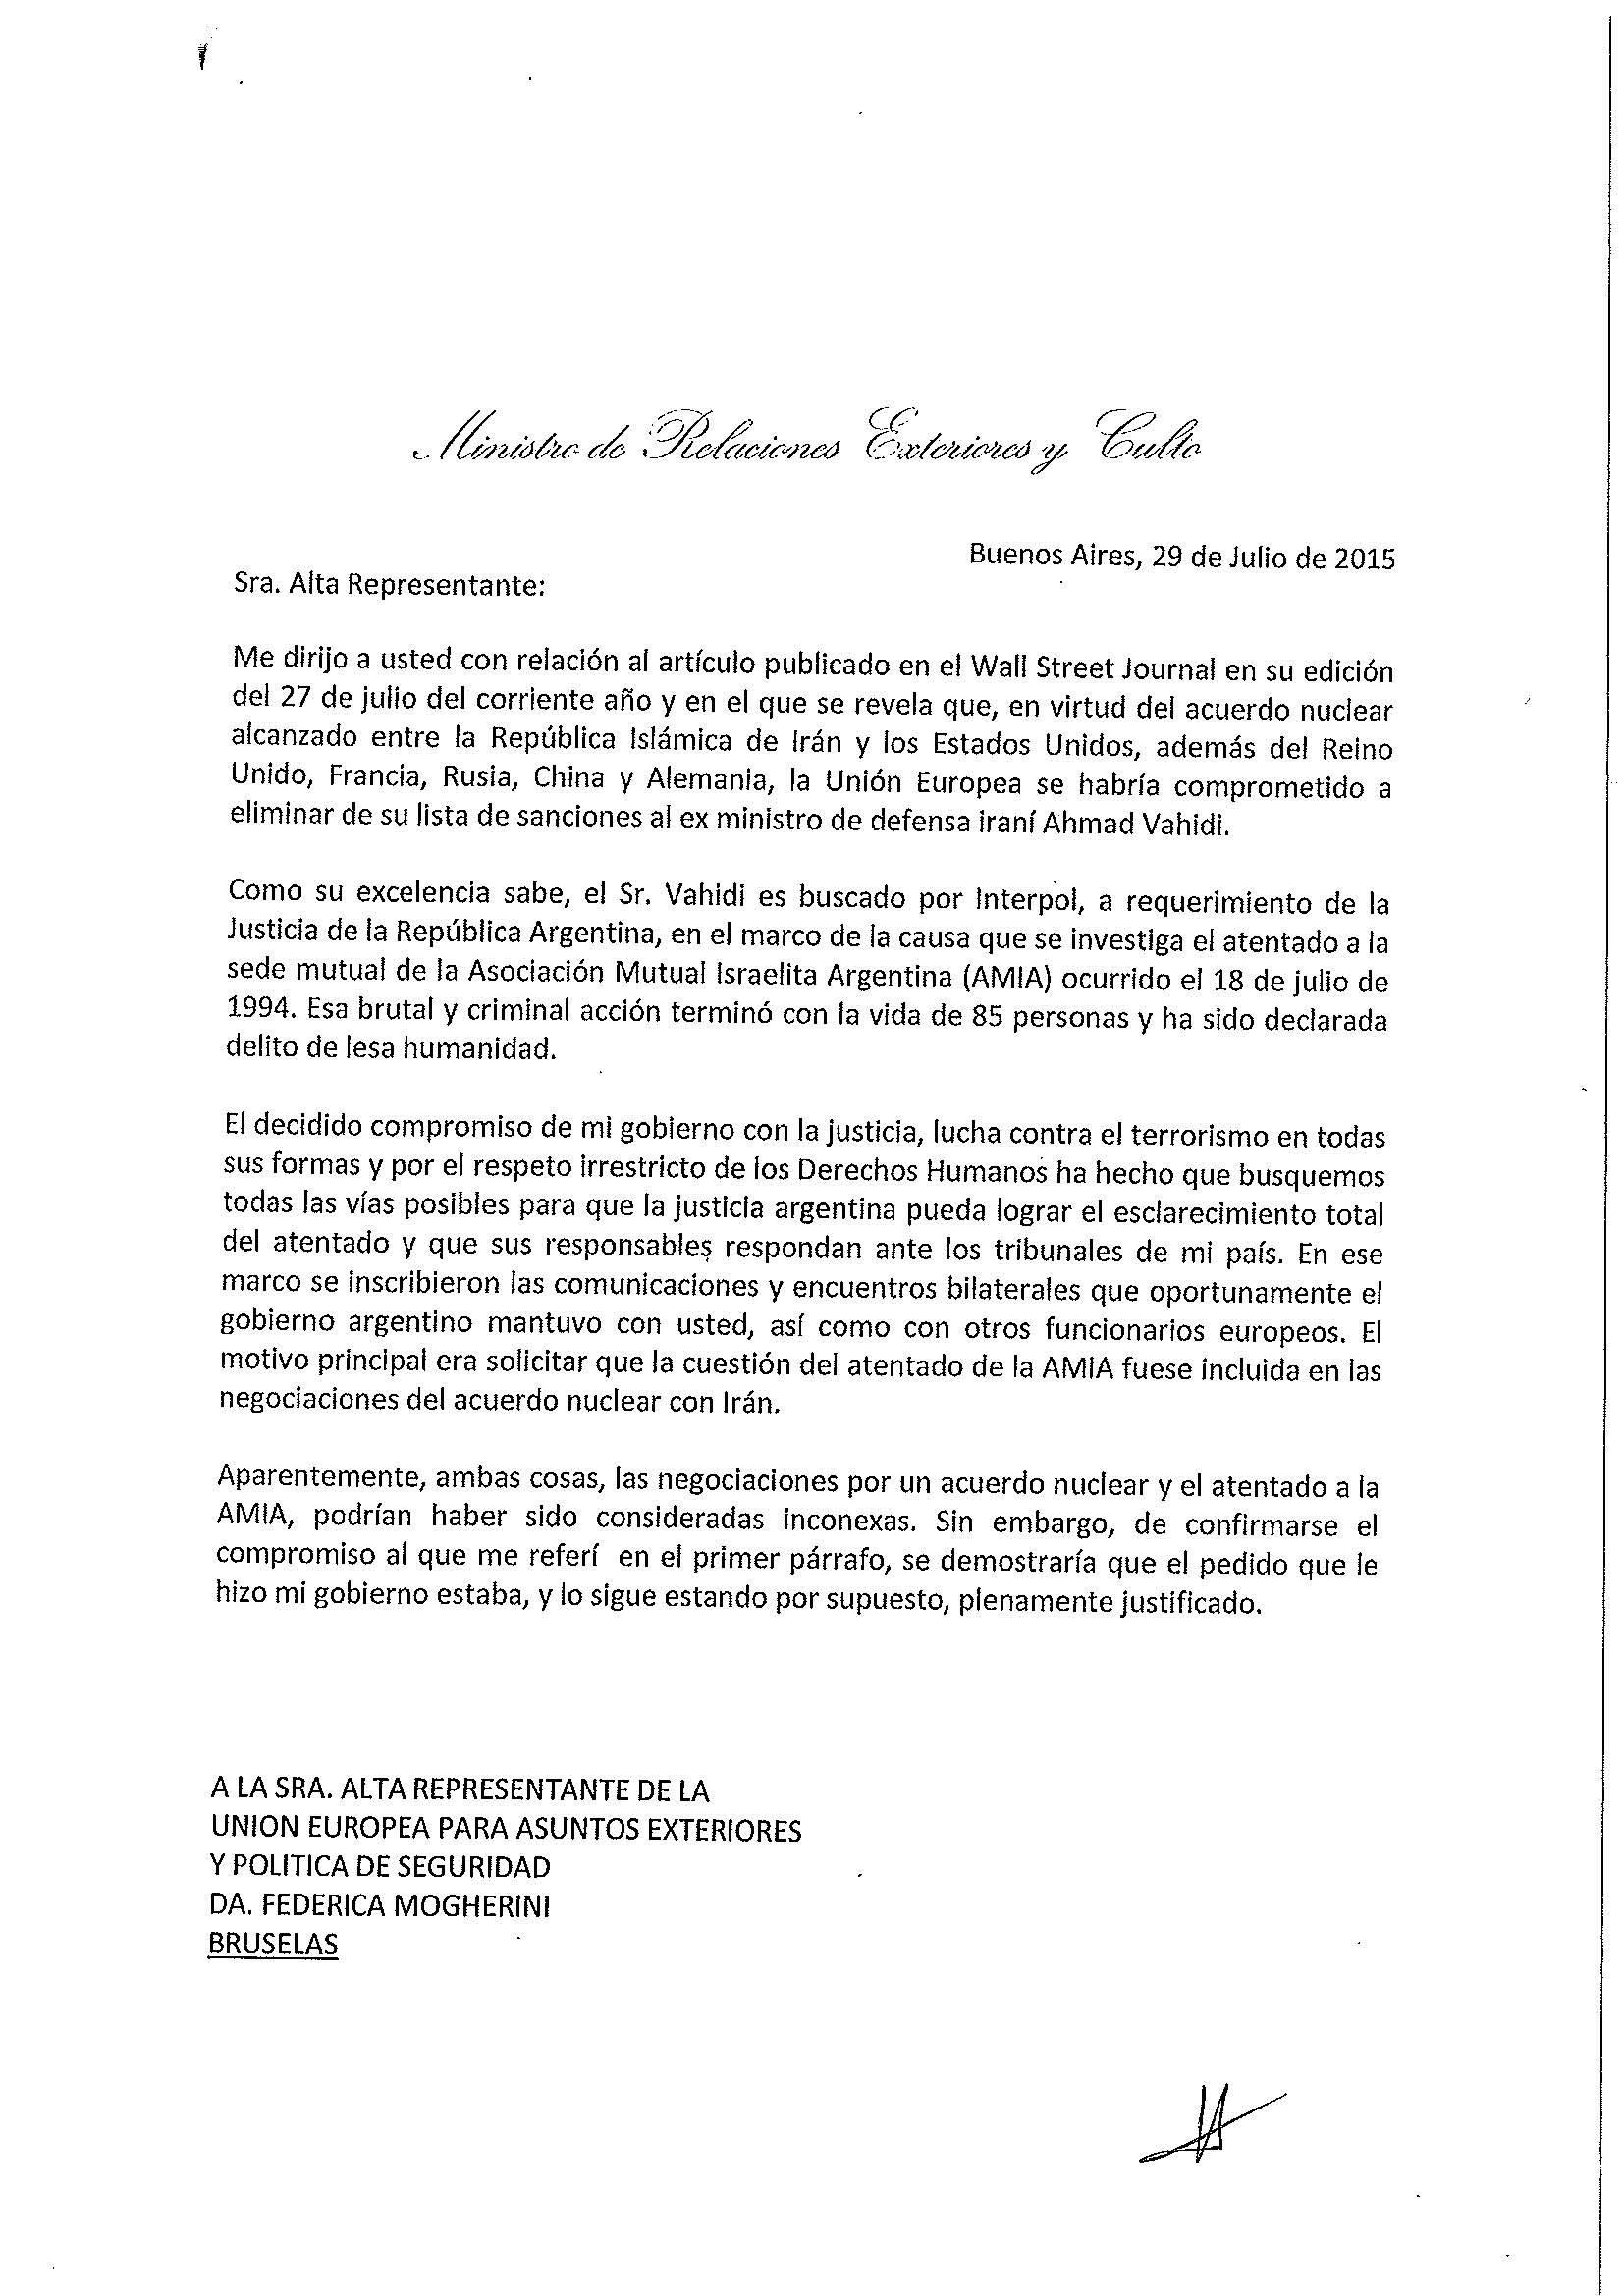 nota a Mogherini en español_Page_1